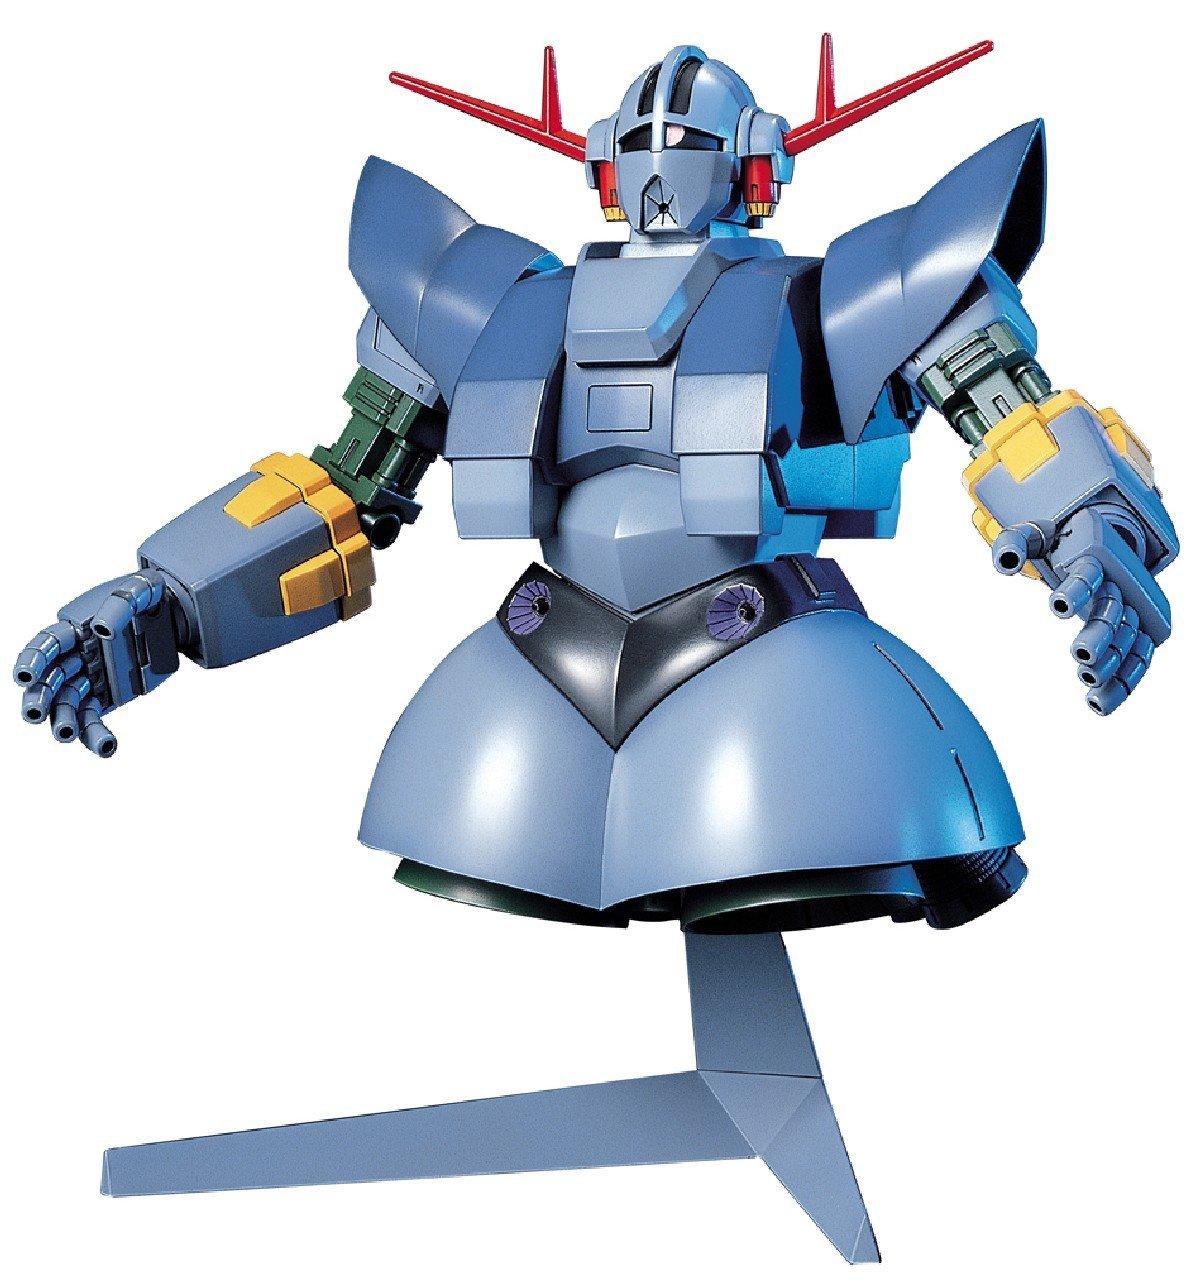 20-mobile-suit-last-boss-strongest-in-gundam 20